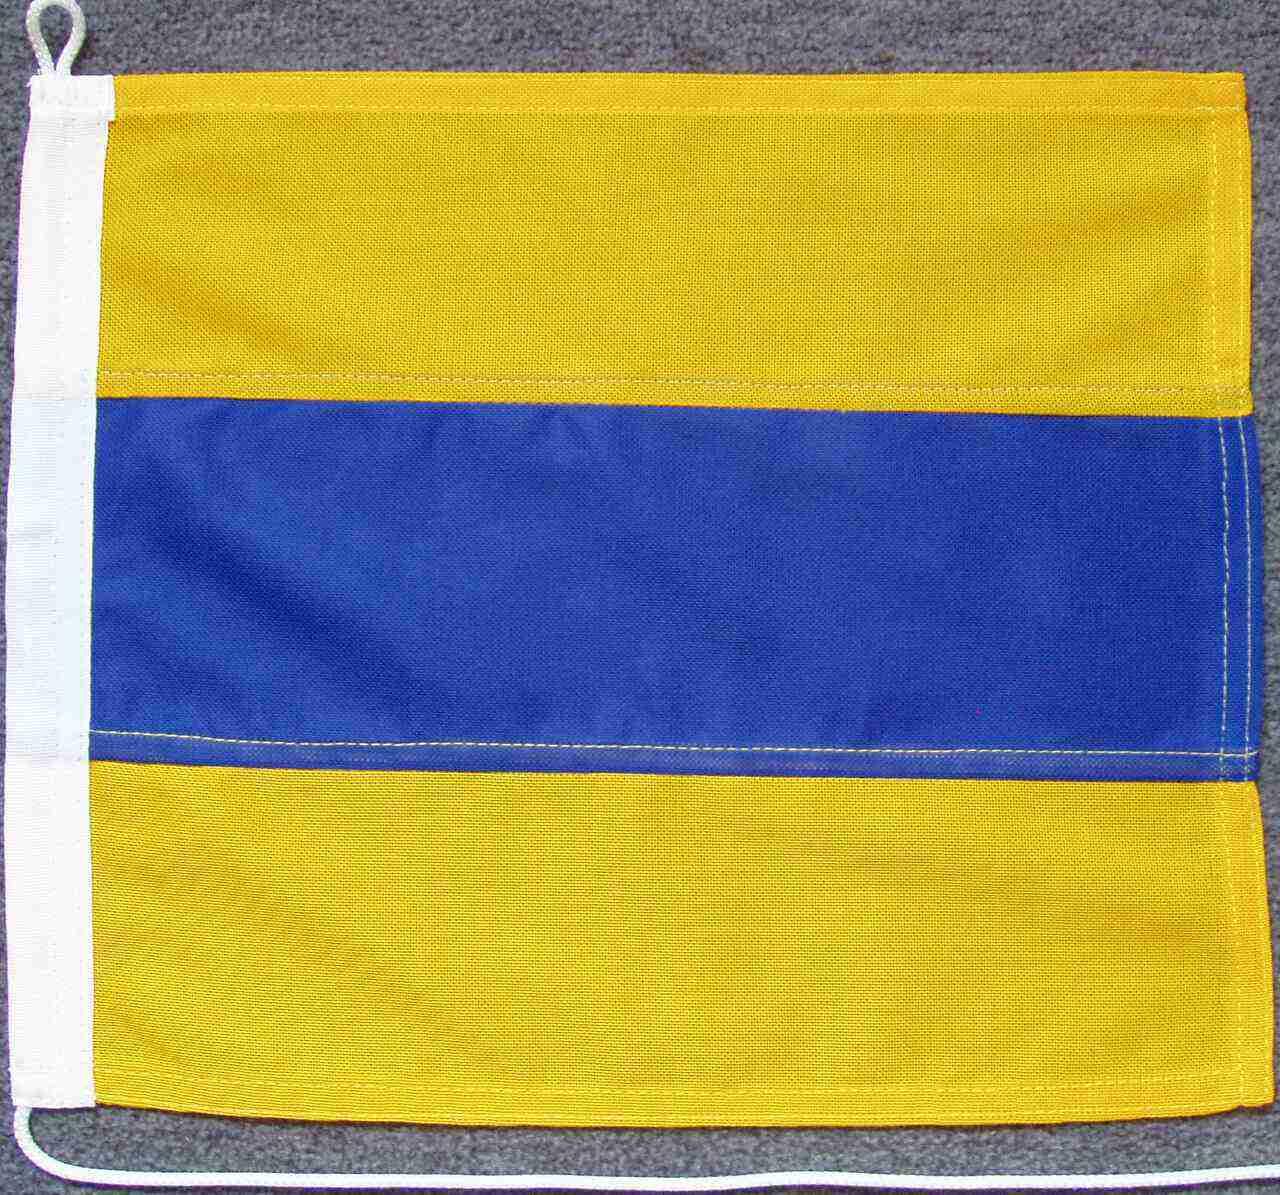 Signalflagge D - Delta